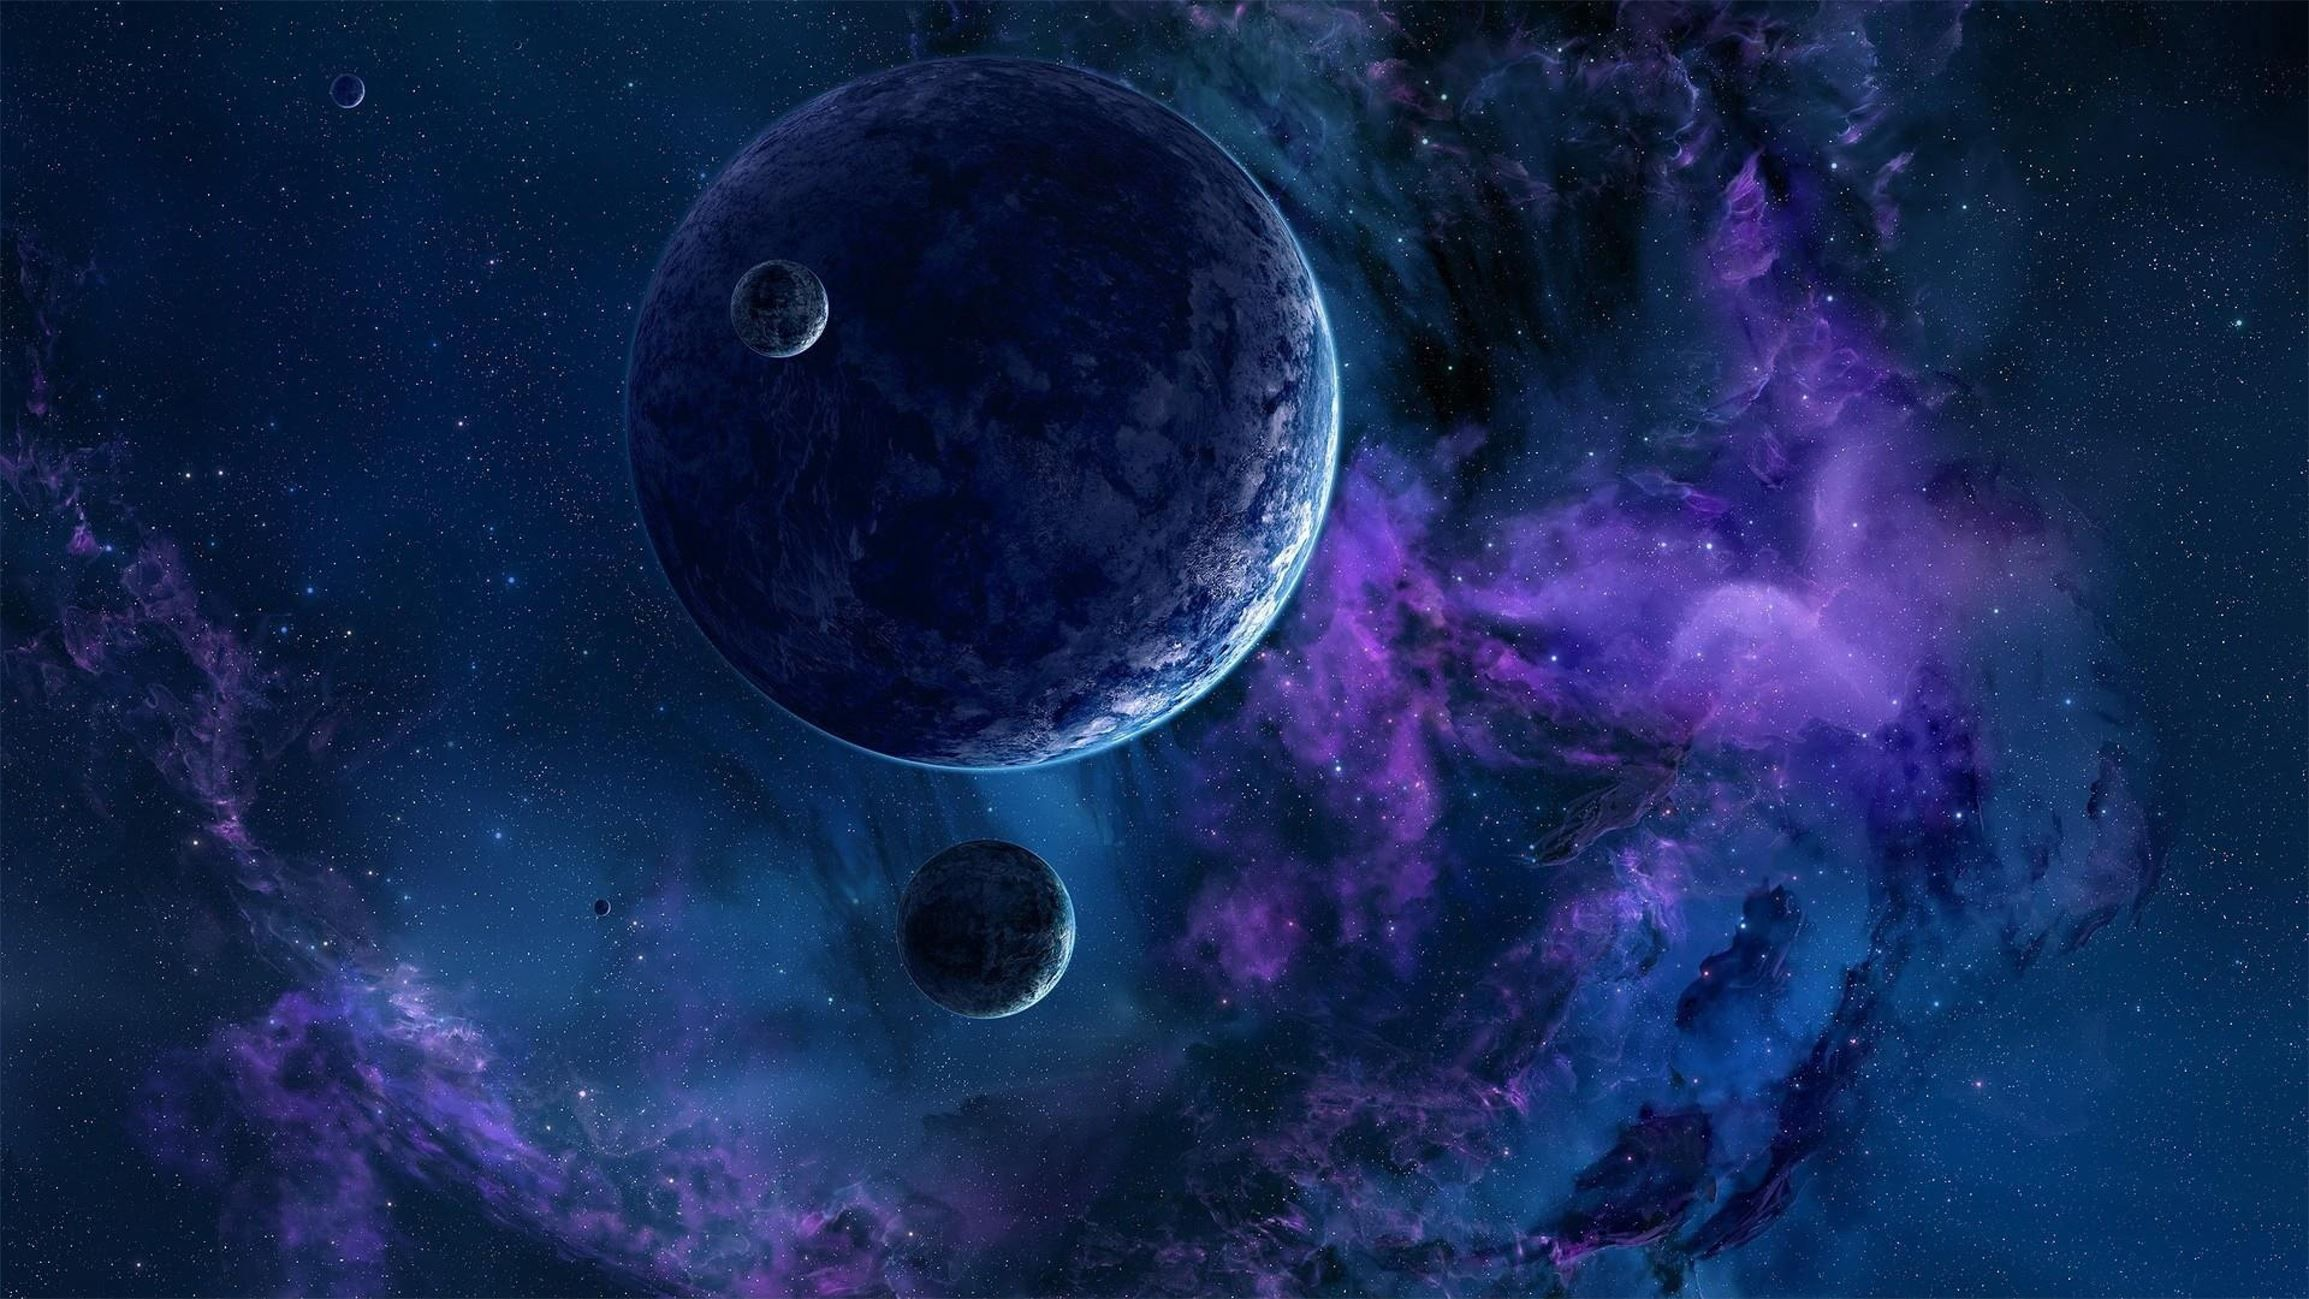 Hd wallpaper universe - Universe Ultra Hd Wallpaper Http Wallpapers And Backgrounds Net